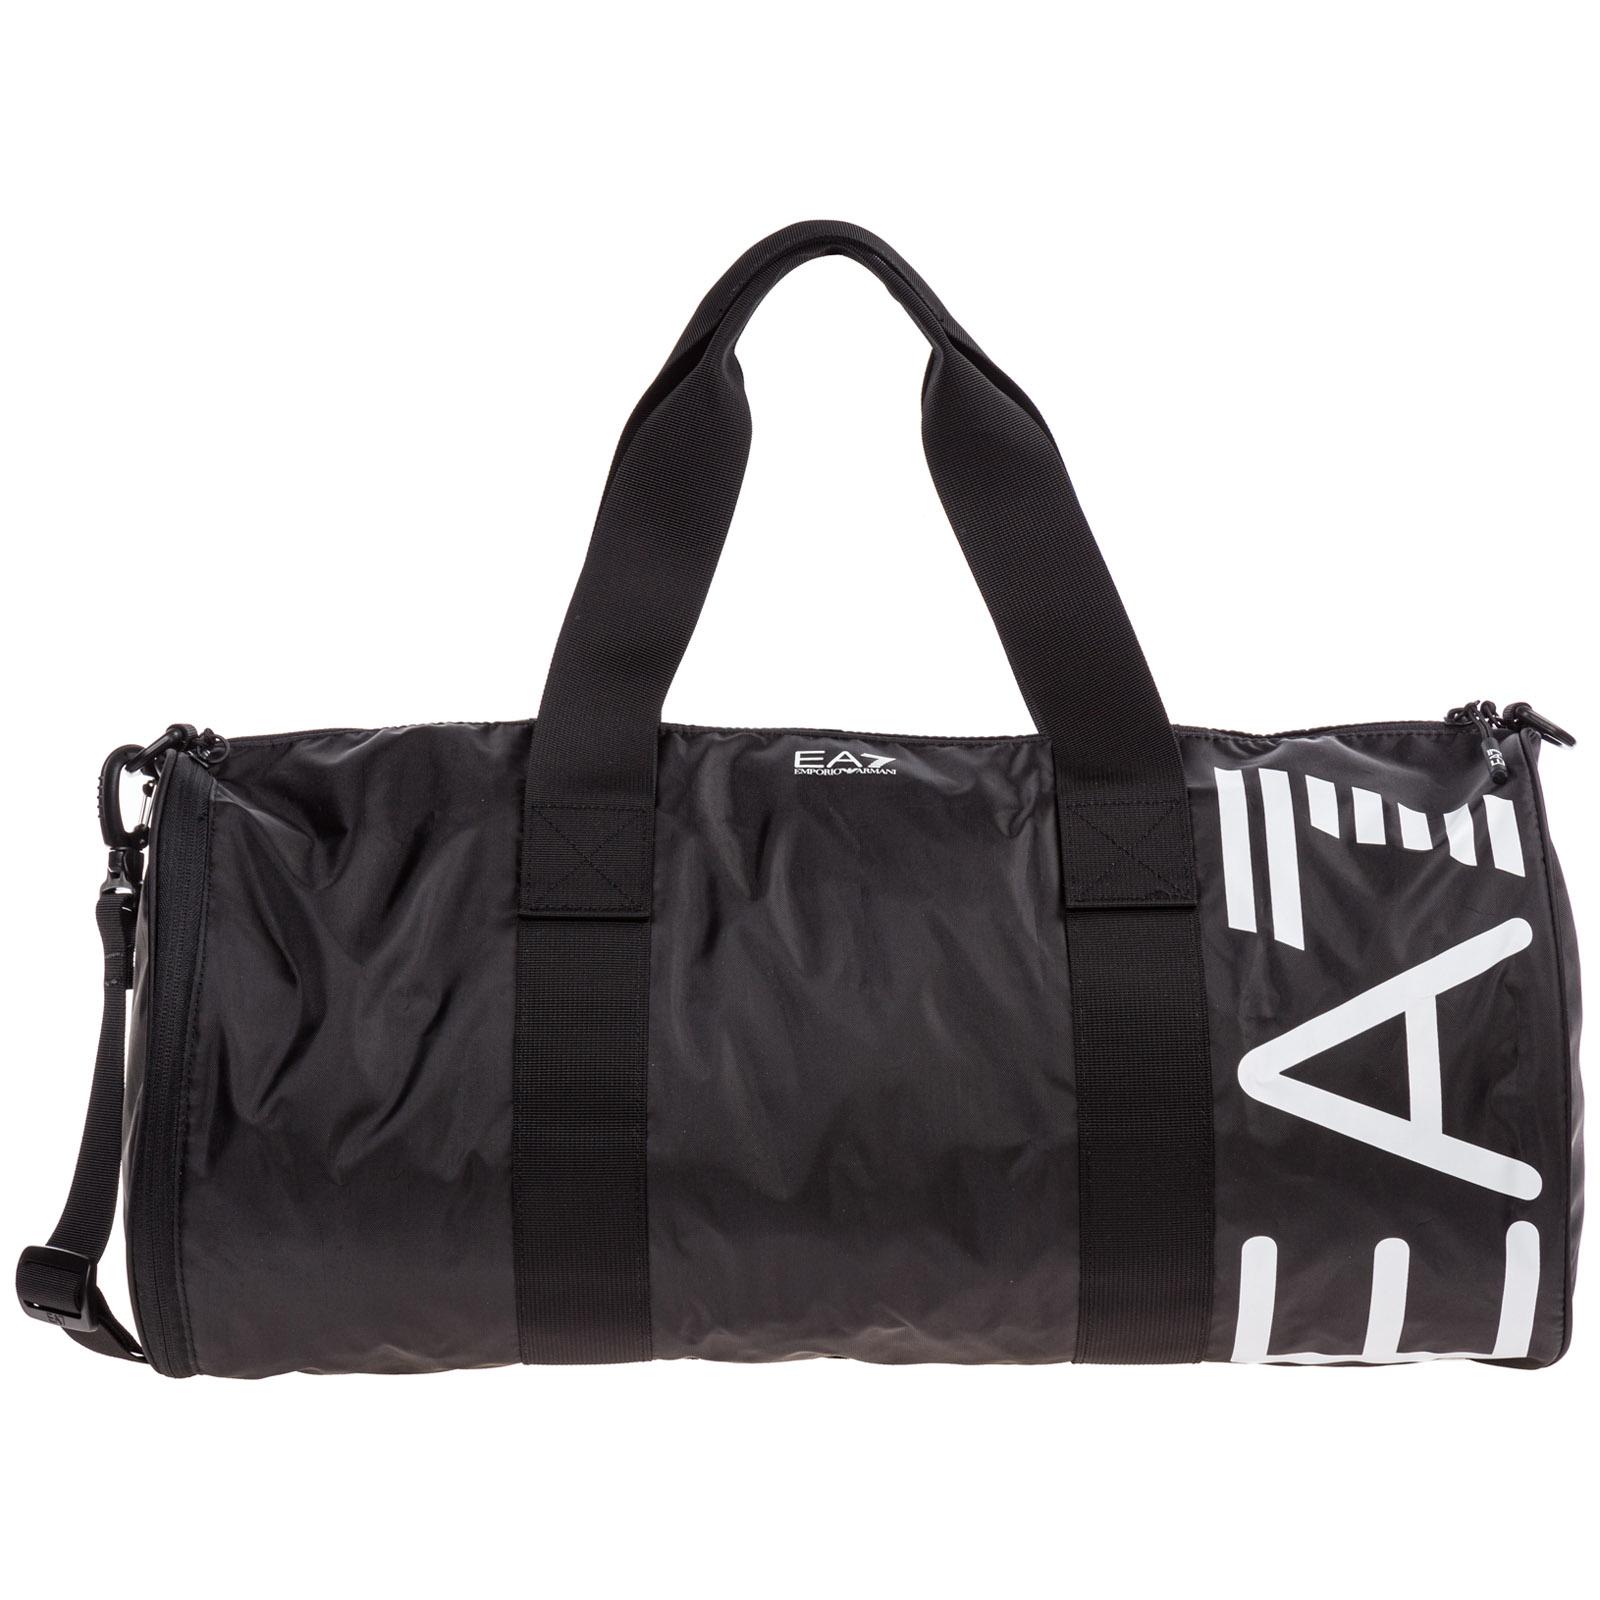 4c11d8414f Travel duffle weekend shoulder bag nylon